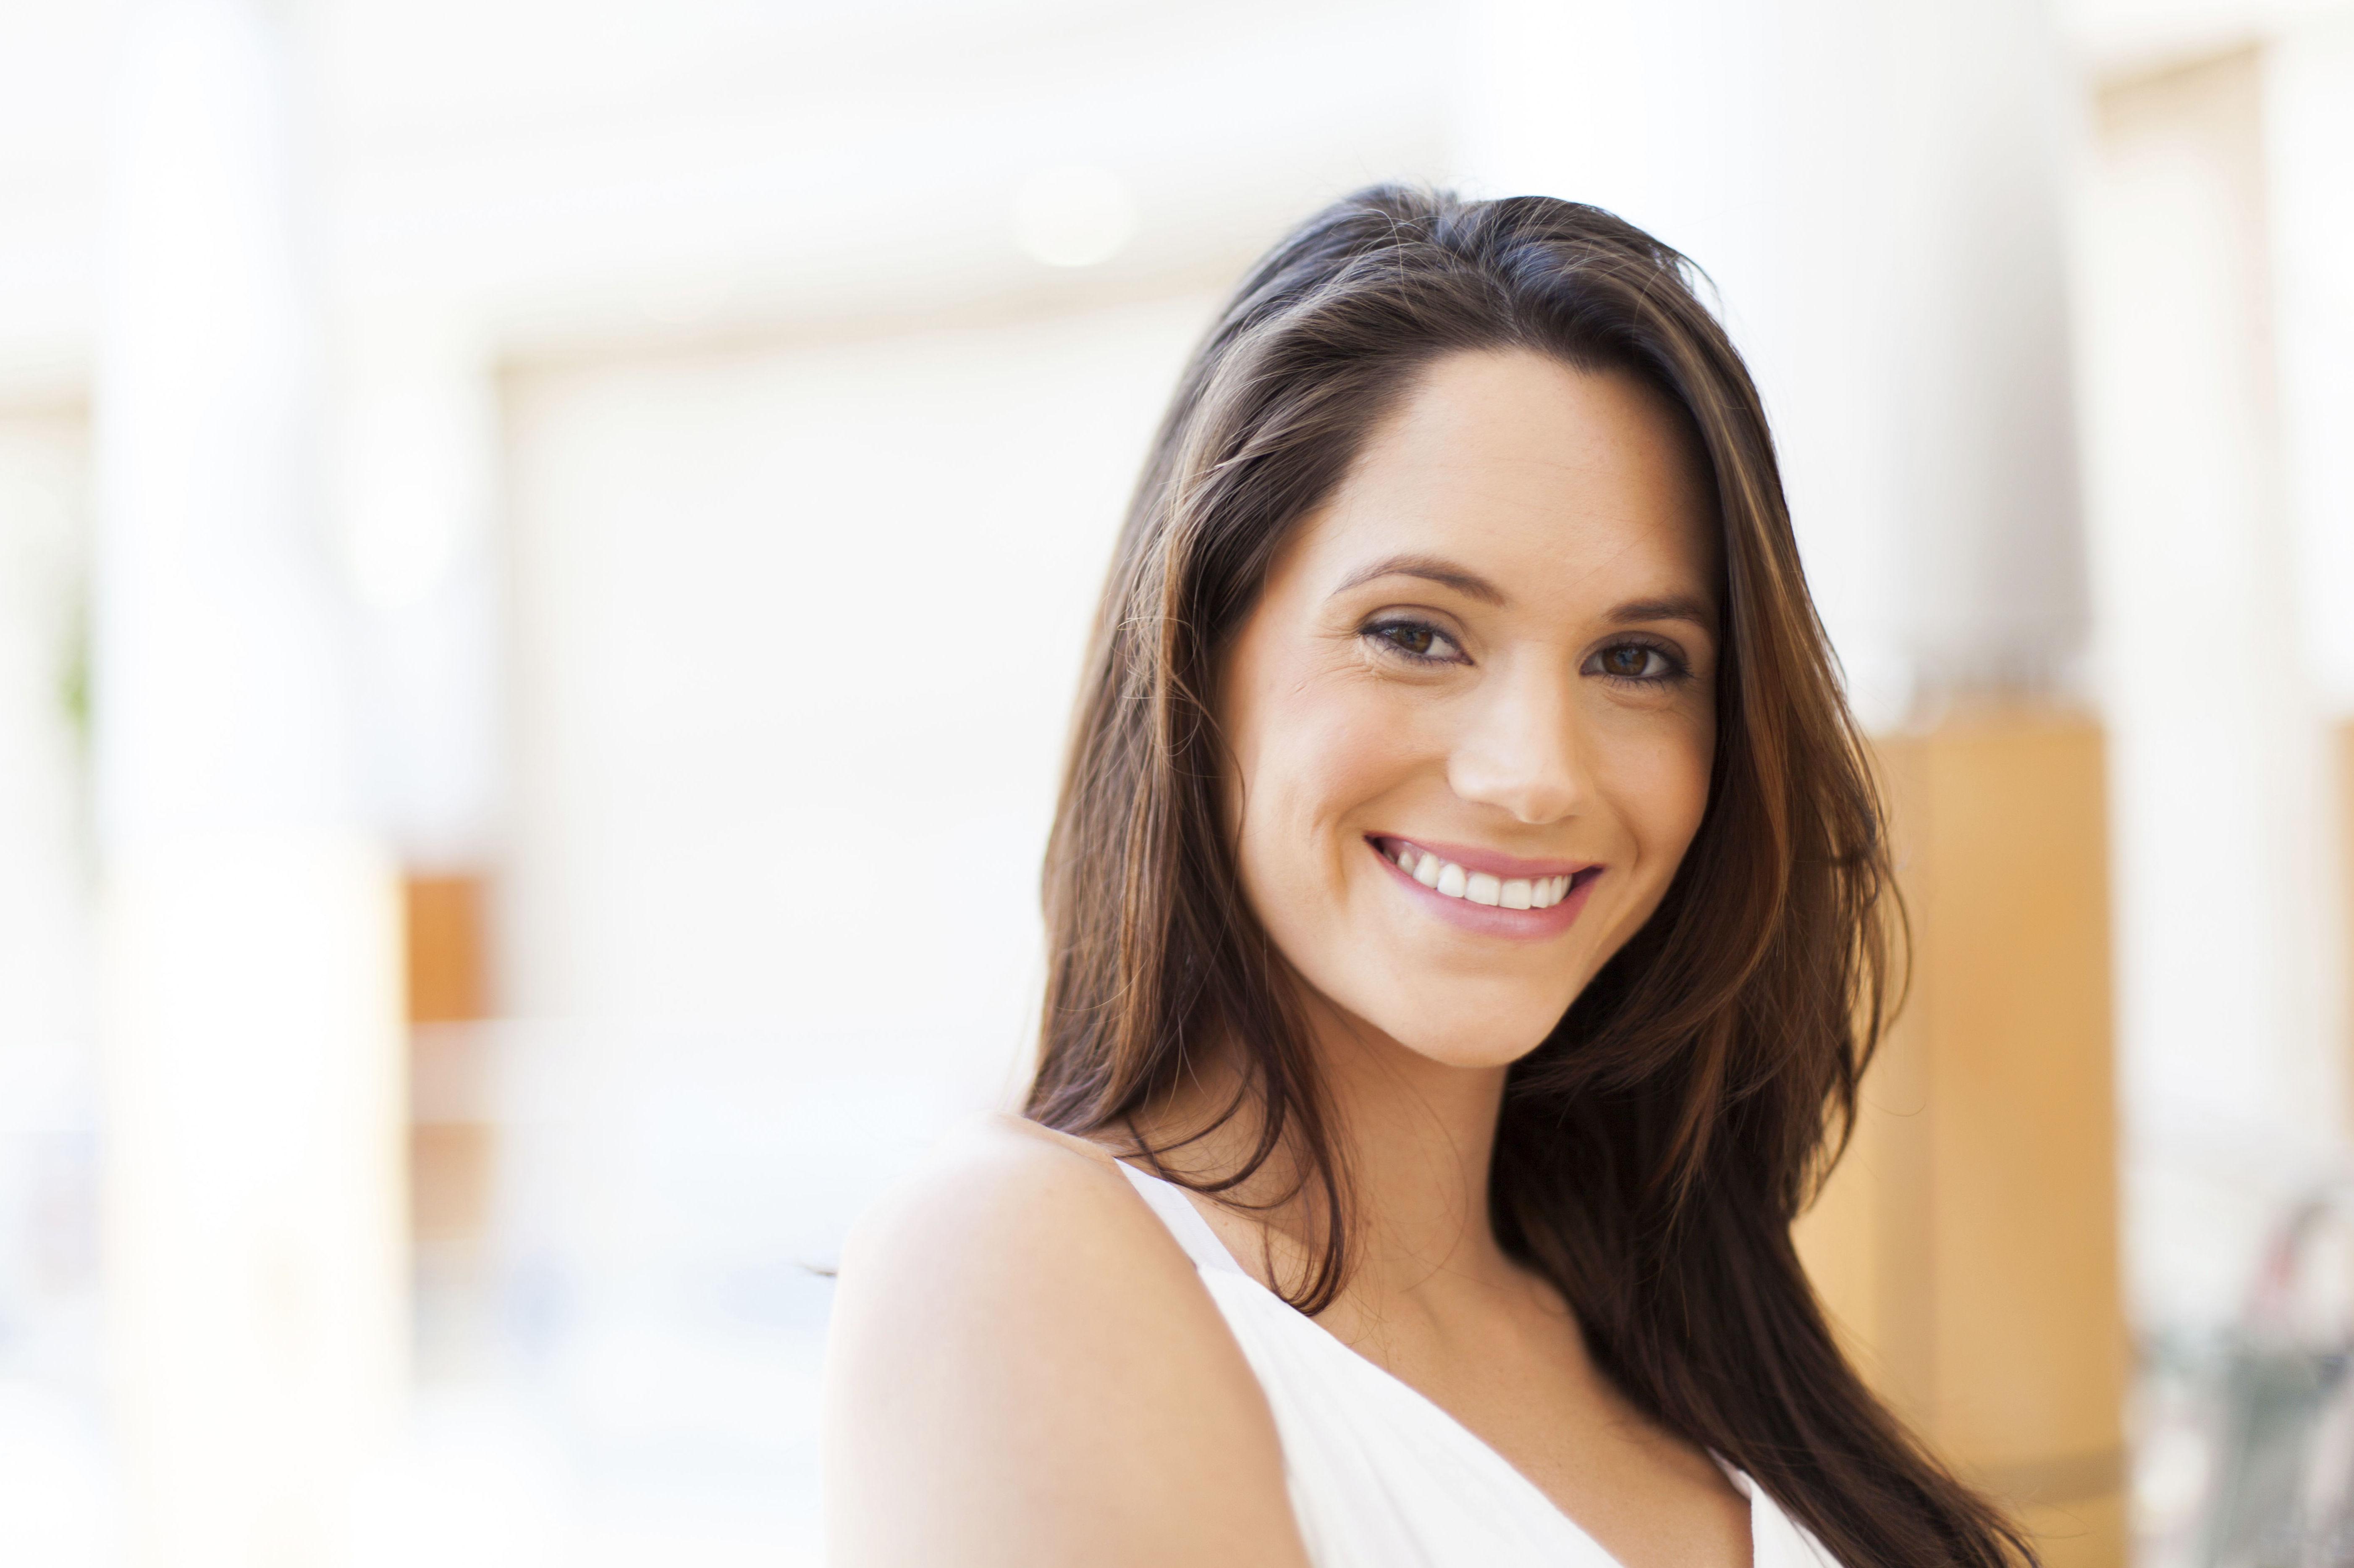 Estética Dental: Servicios de Centro Odontológico Dra Molina Delgado